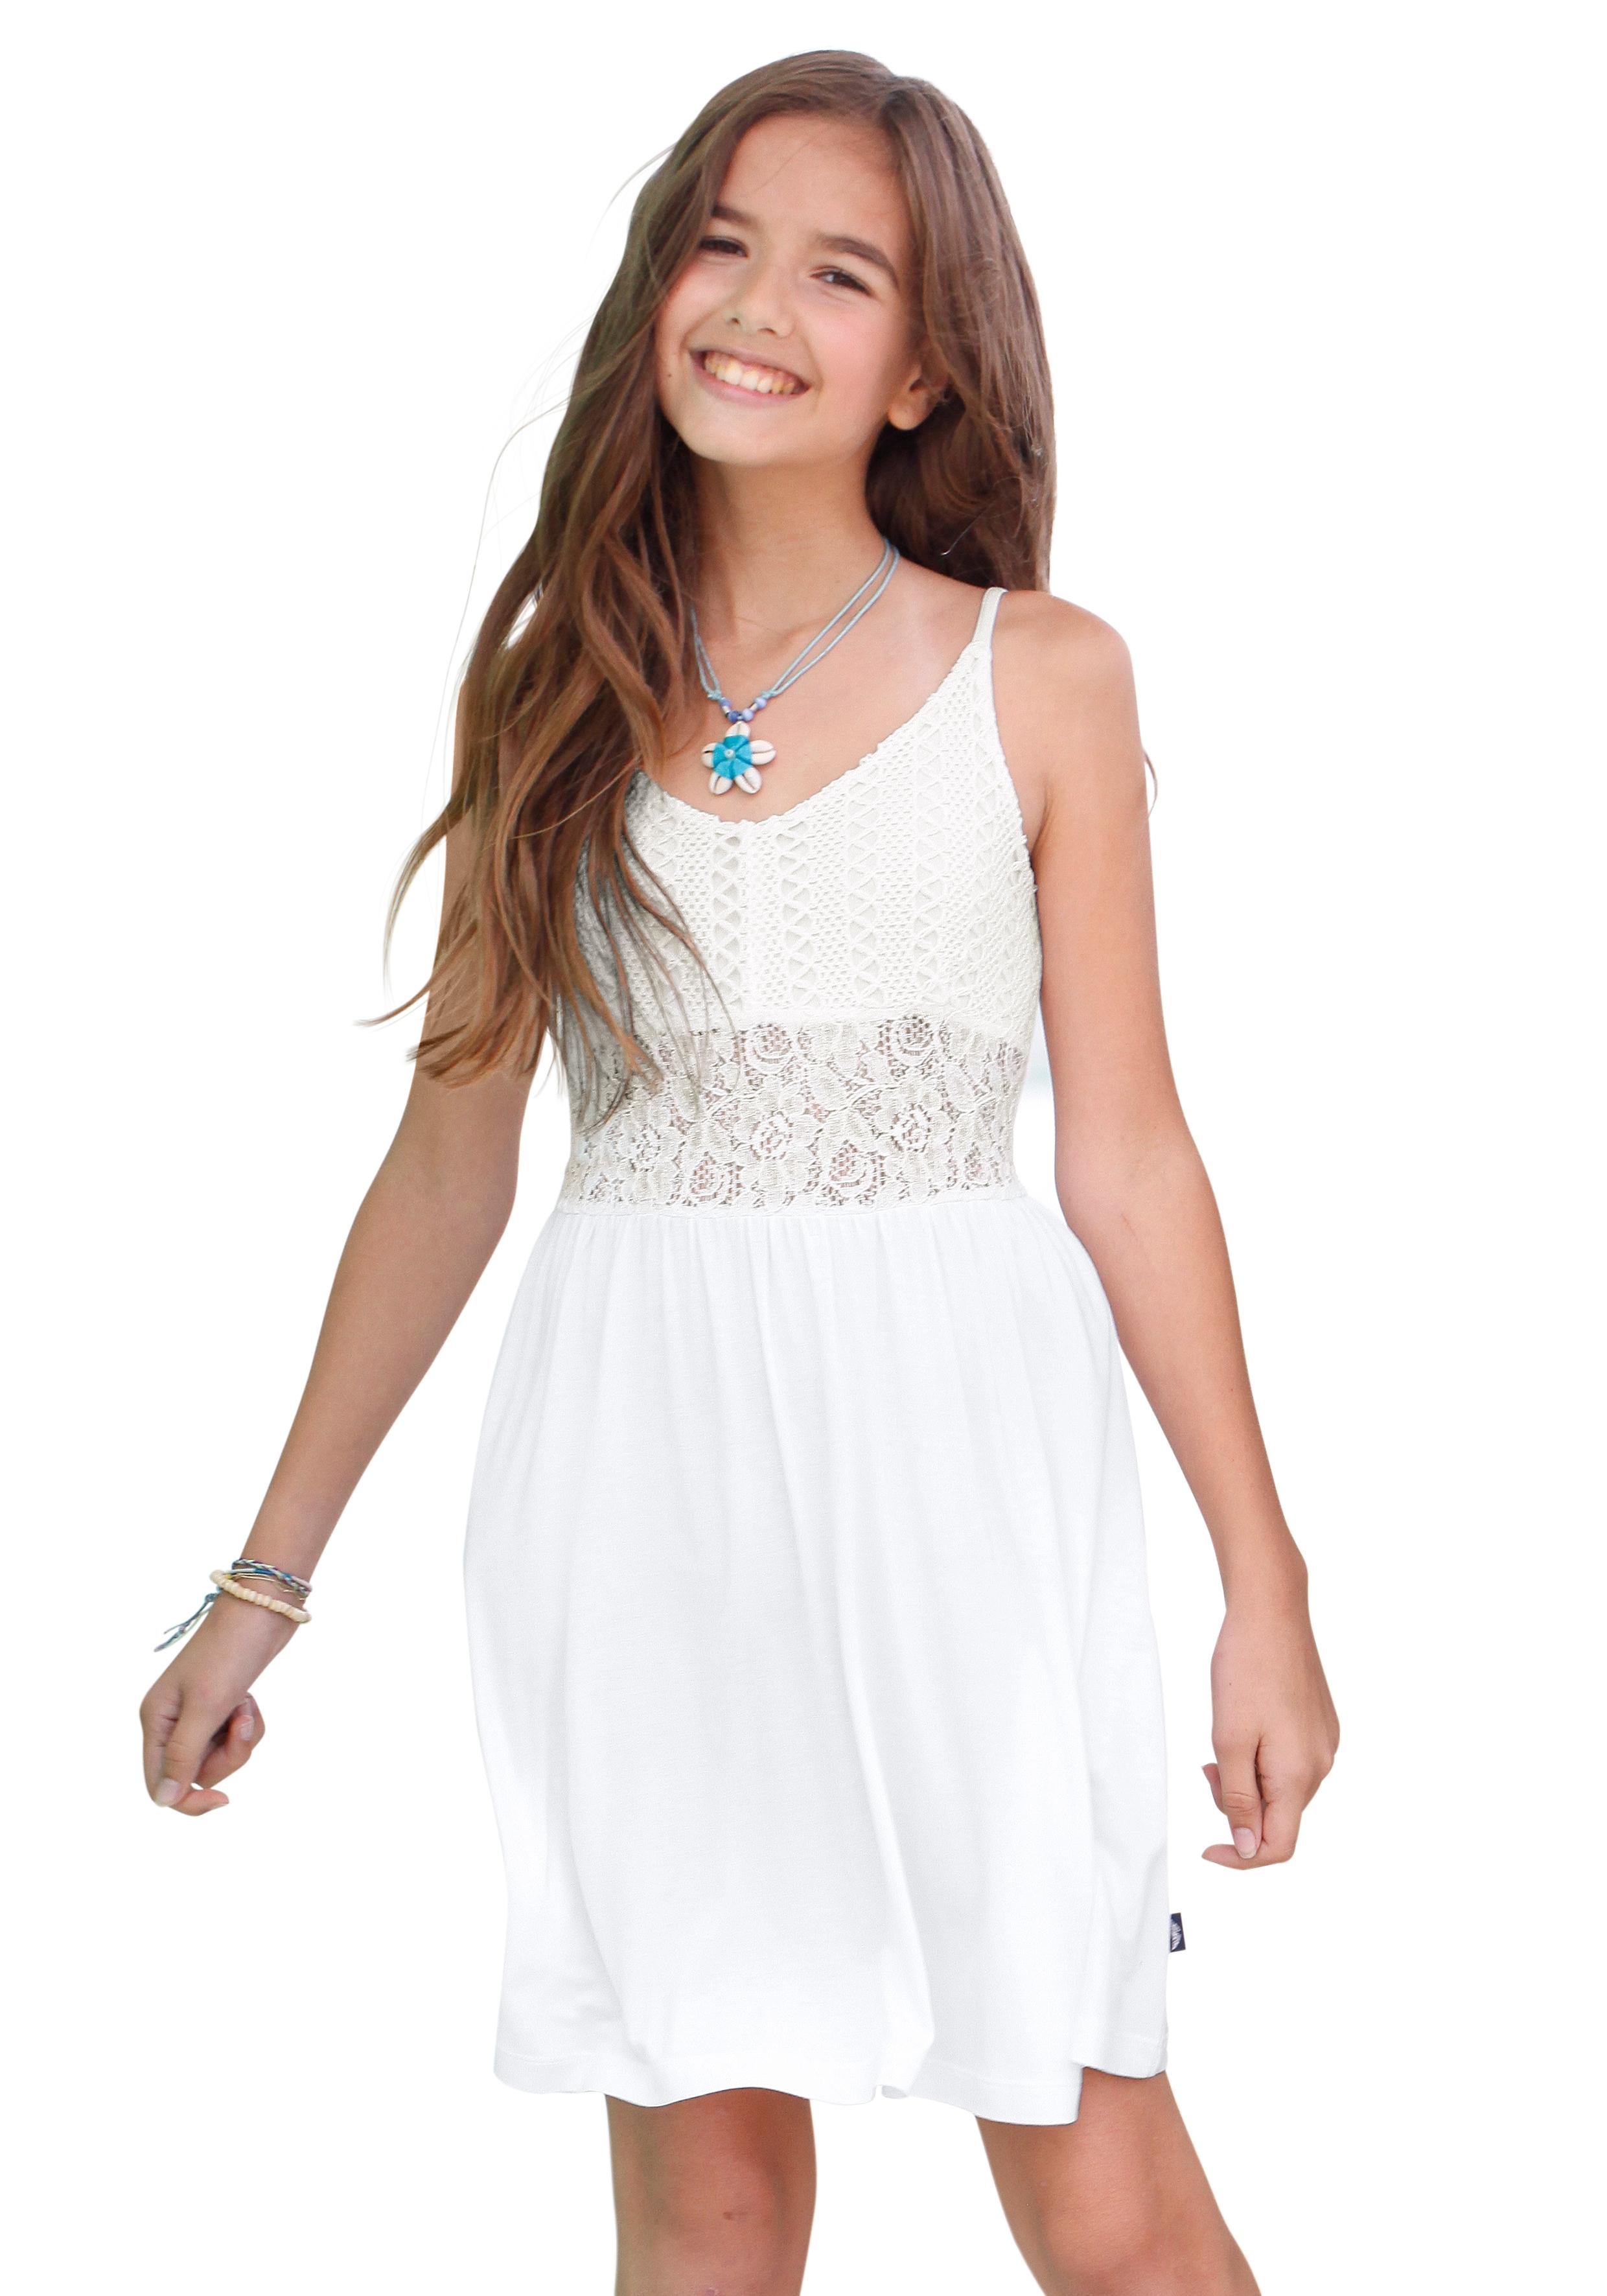 e86b94d8e959e8 Favoriete ARIZONA Meisjes-jurk met kanten inzet nu online kopen